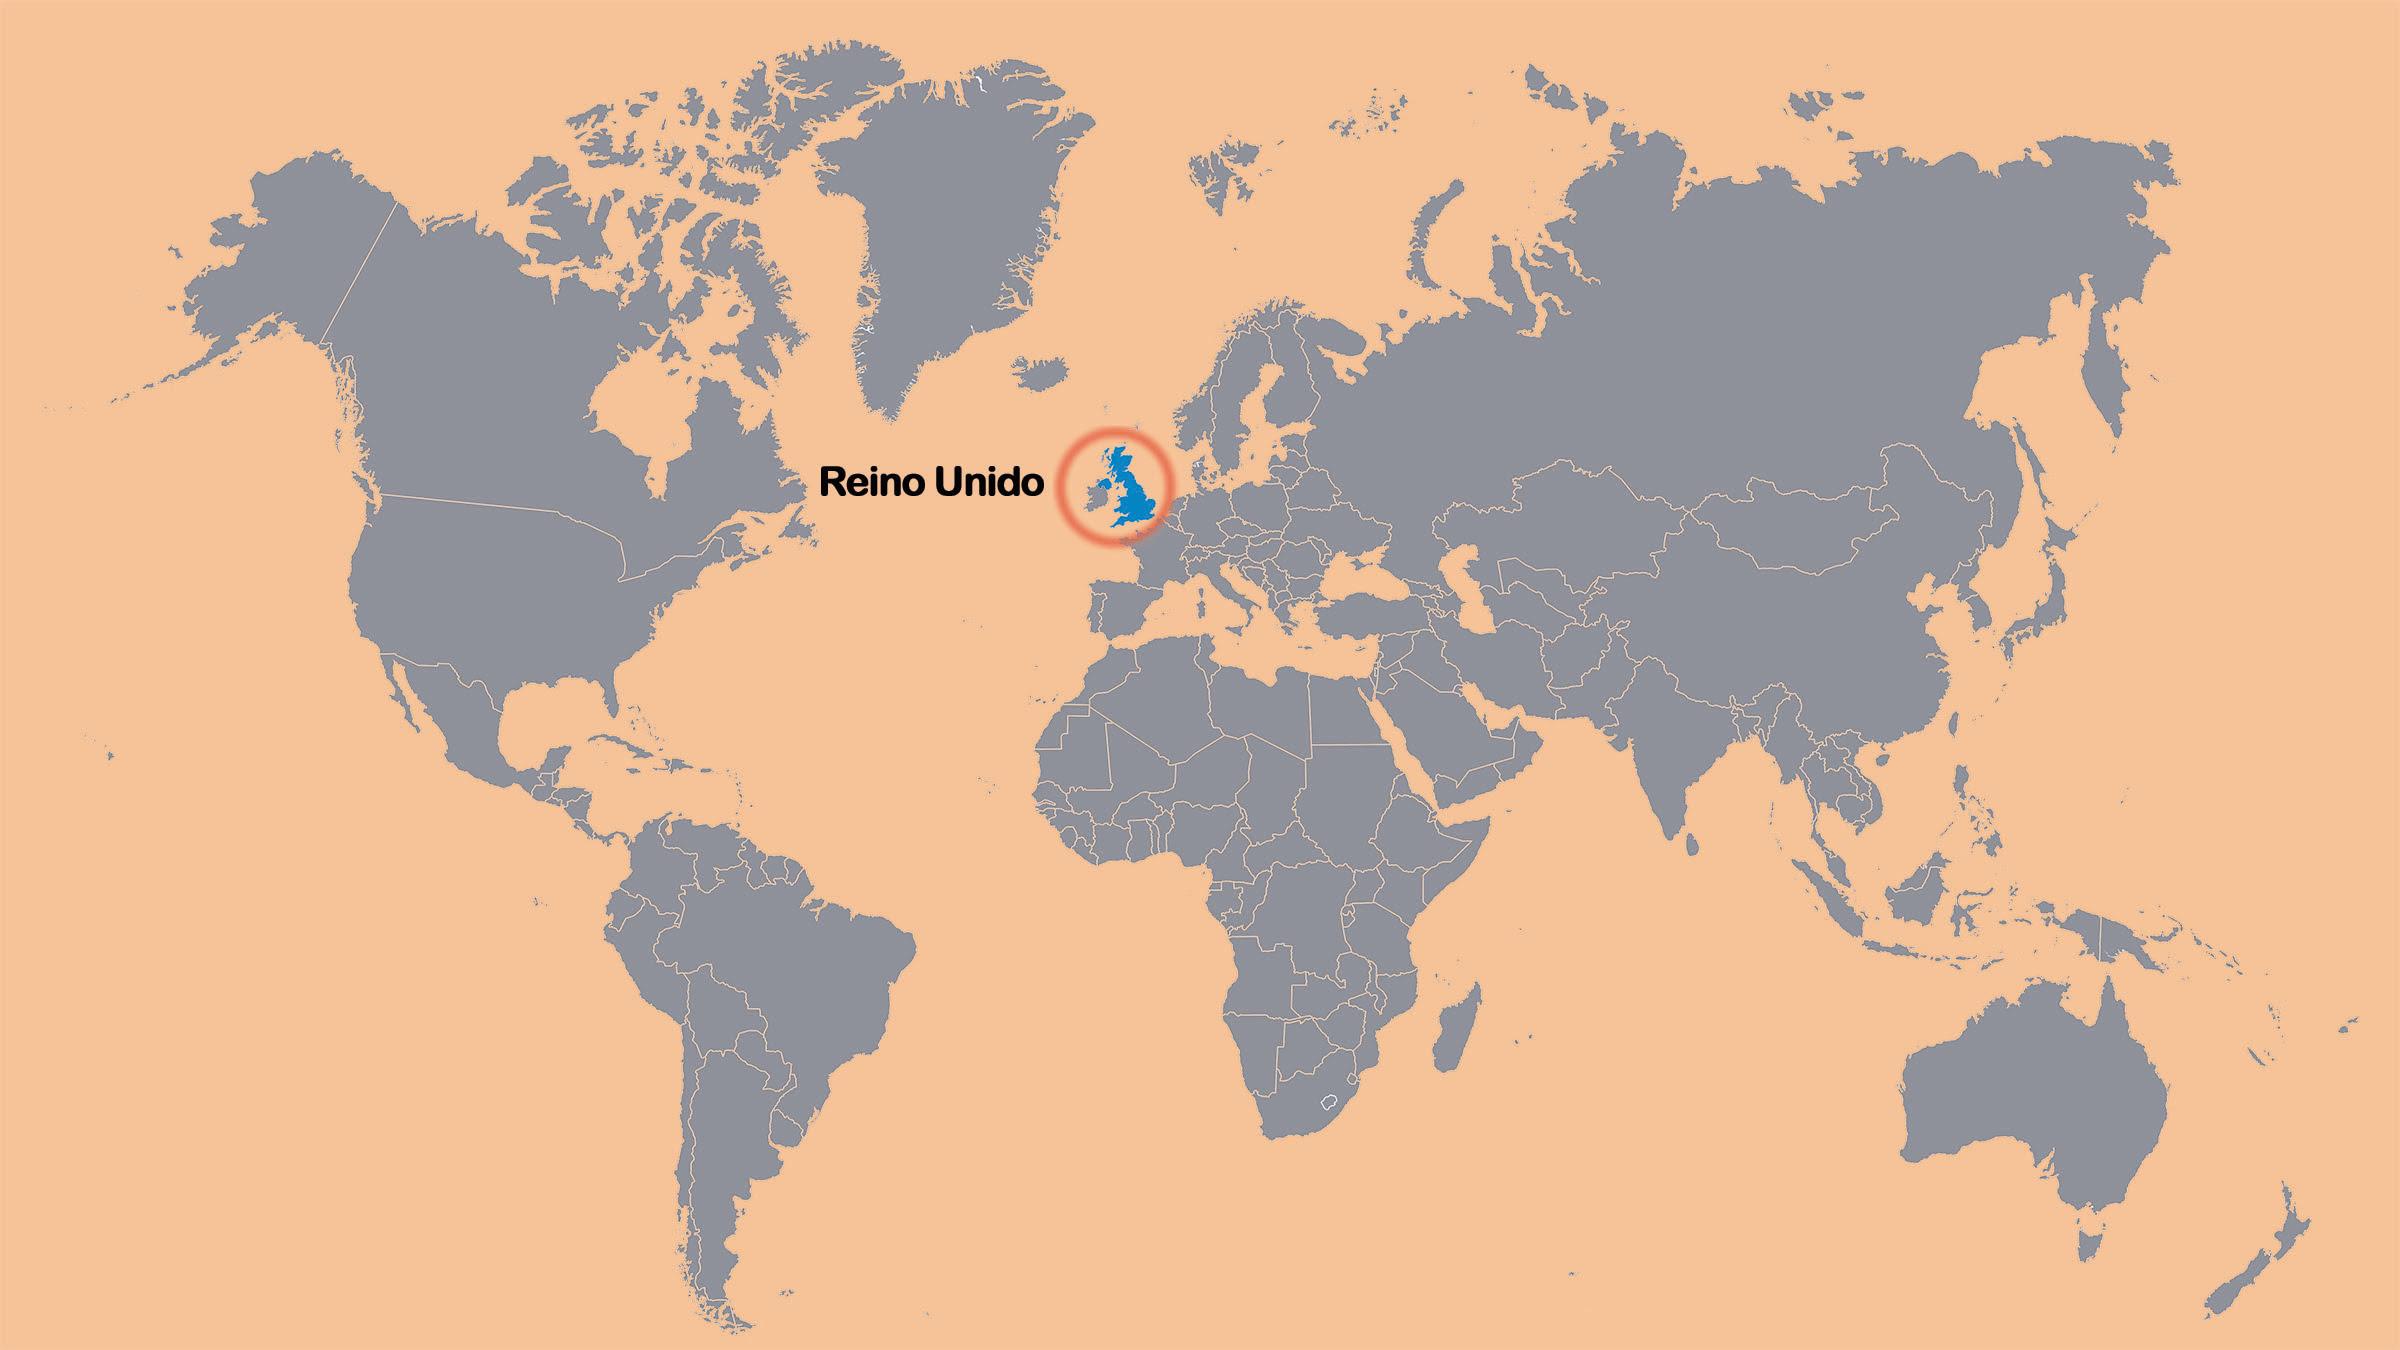 Mapa mundial señalando Reino Unido